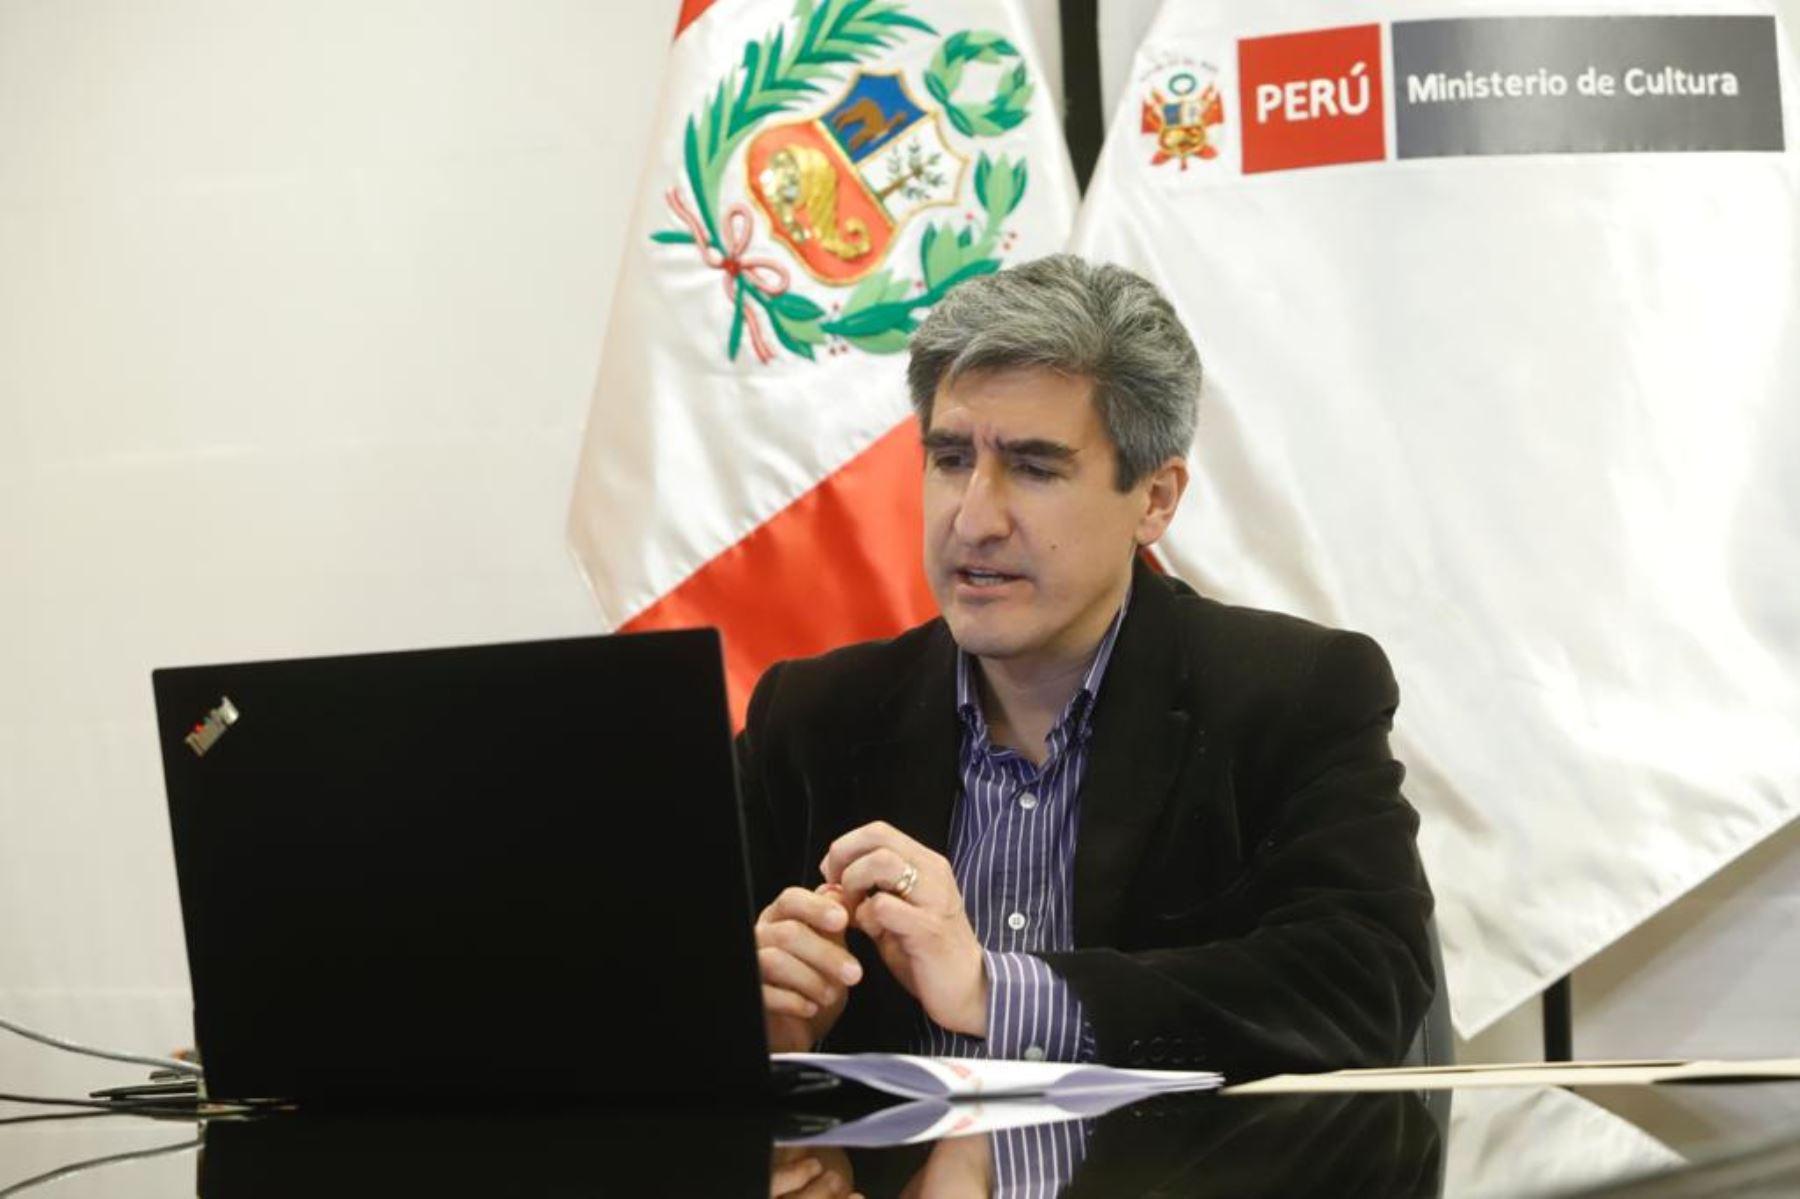 El ministro Alejandro Neyra resaltó que, a la fecha, el sector ha desarrollado 14 cursos de traductores e intérpretes de lenguas indígenas. Foto: Ministerio de Cultura